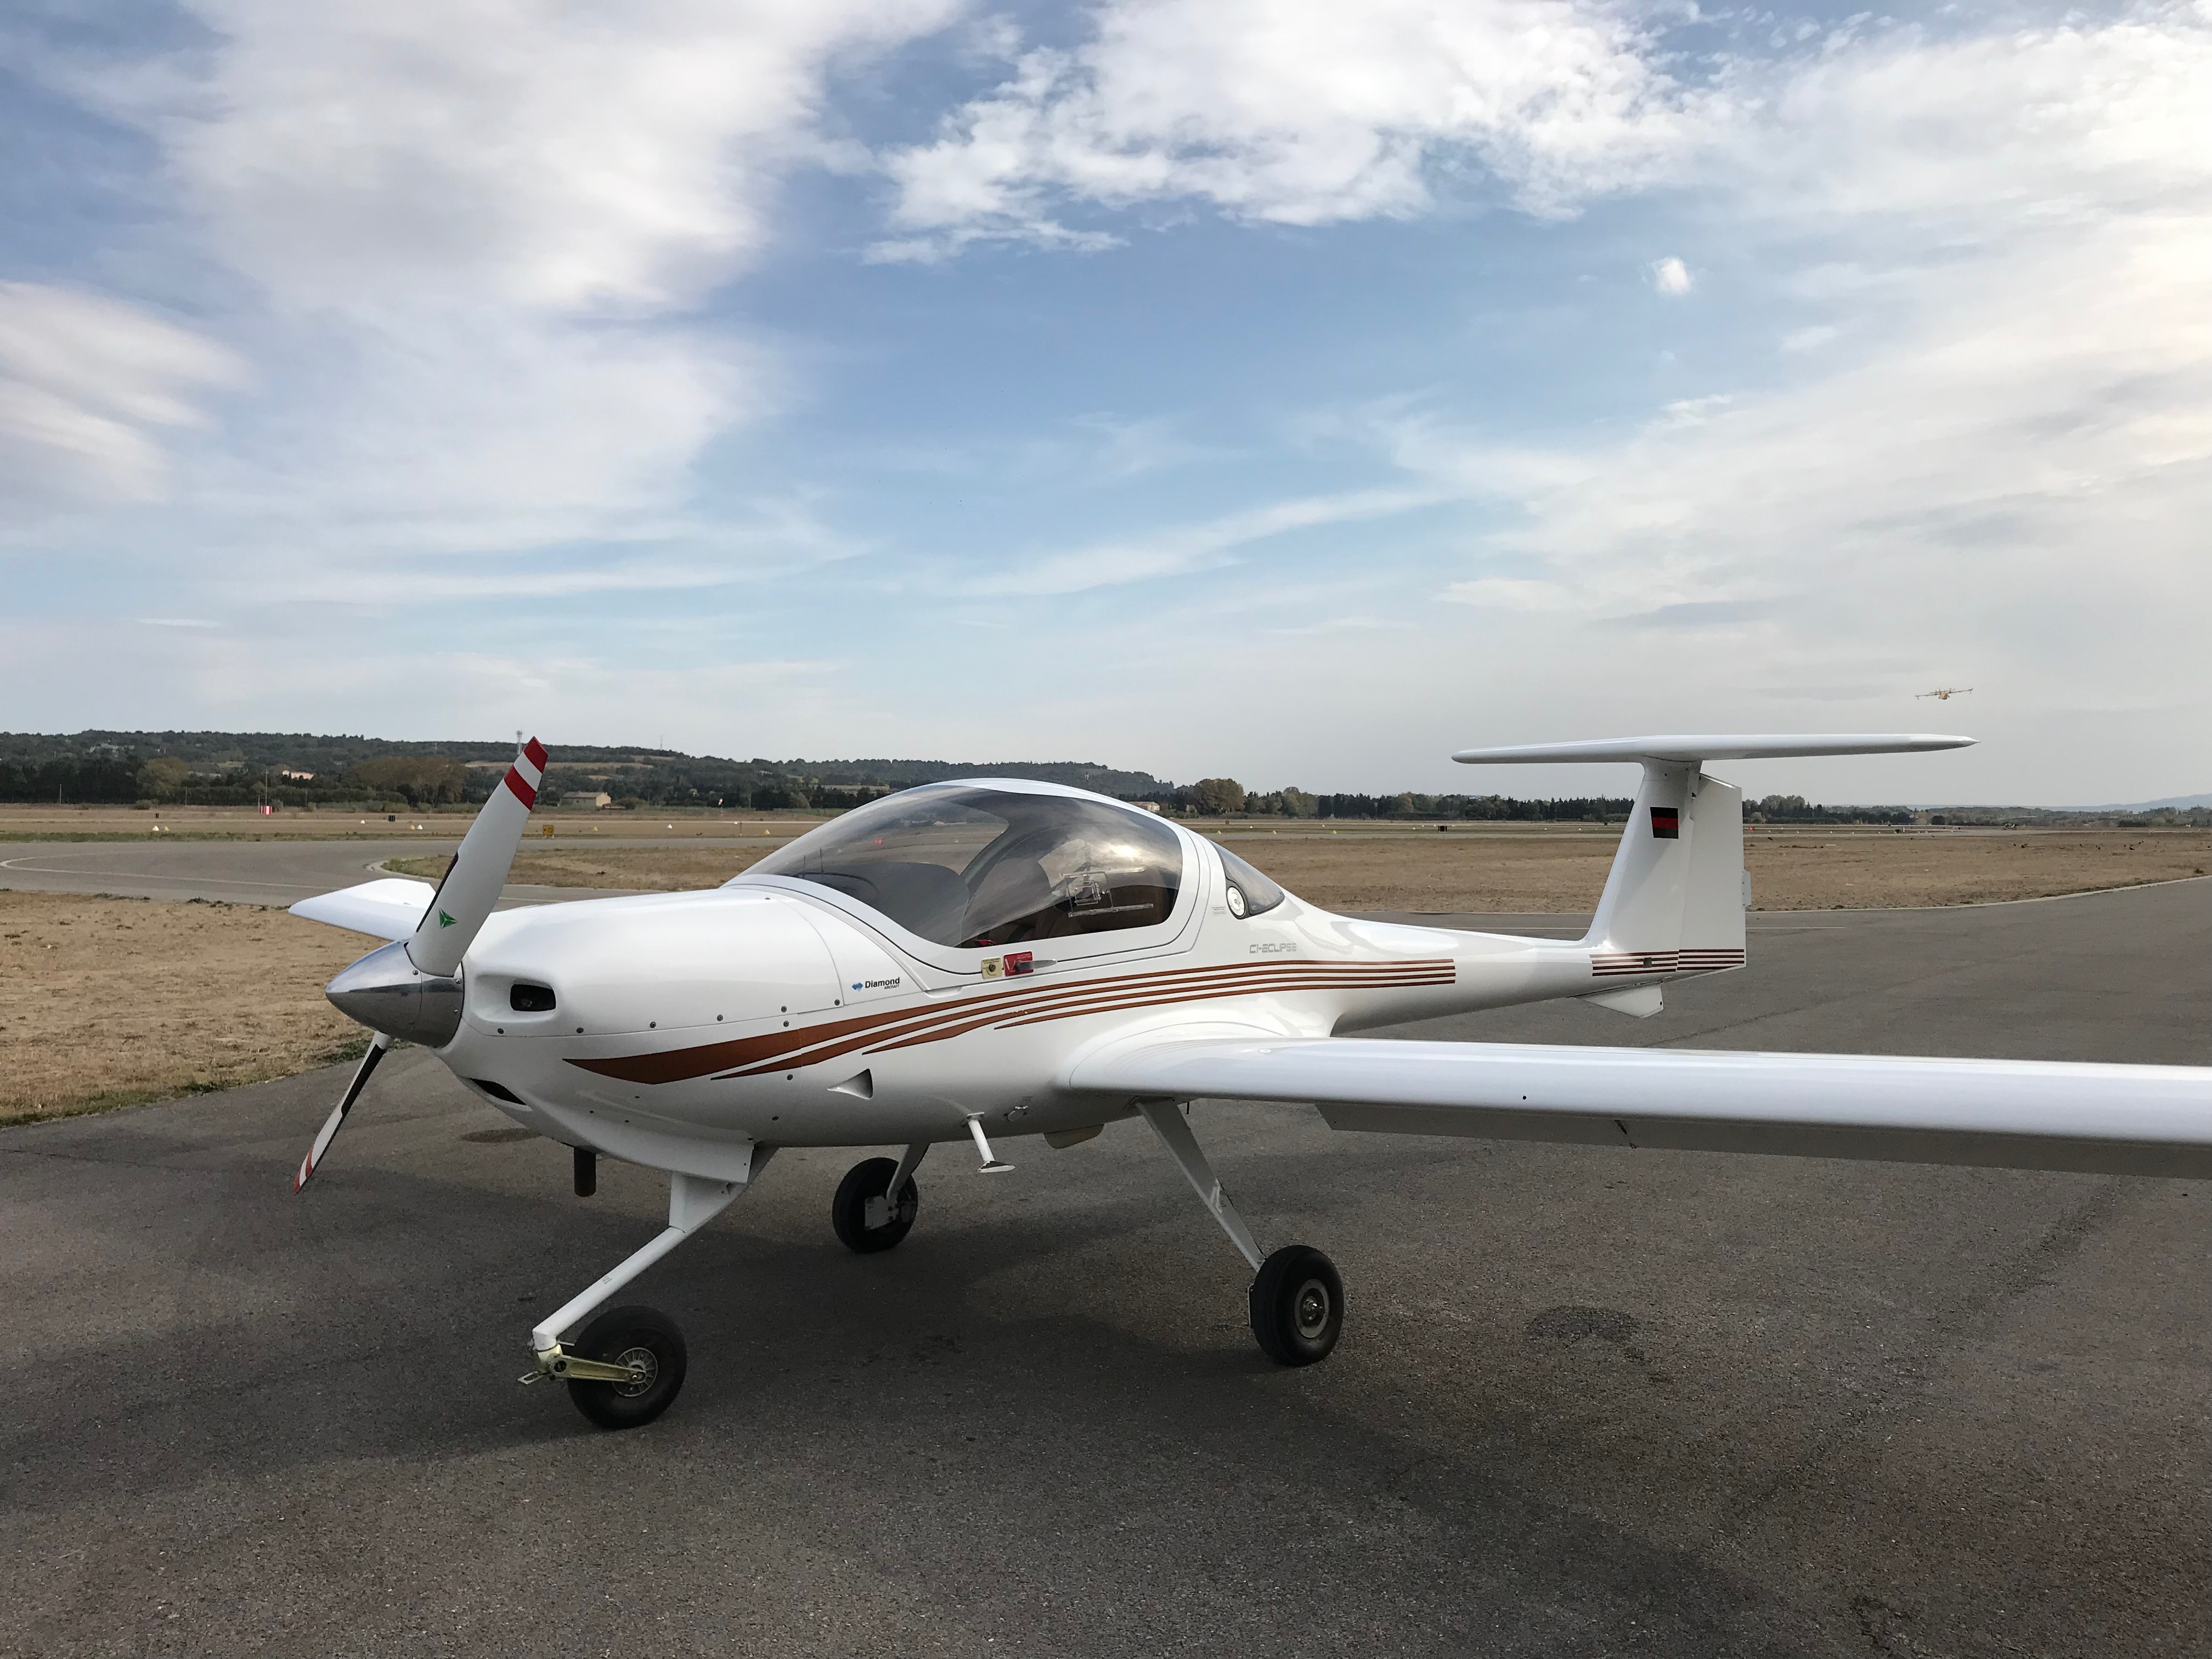 2005 diamond aircraft da 20 c1 eclipse ata by pelletier vente avion neuf et occasion. Black Bedroom Furniture Sets. Home Design Ideas